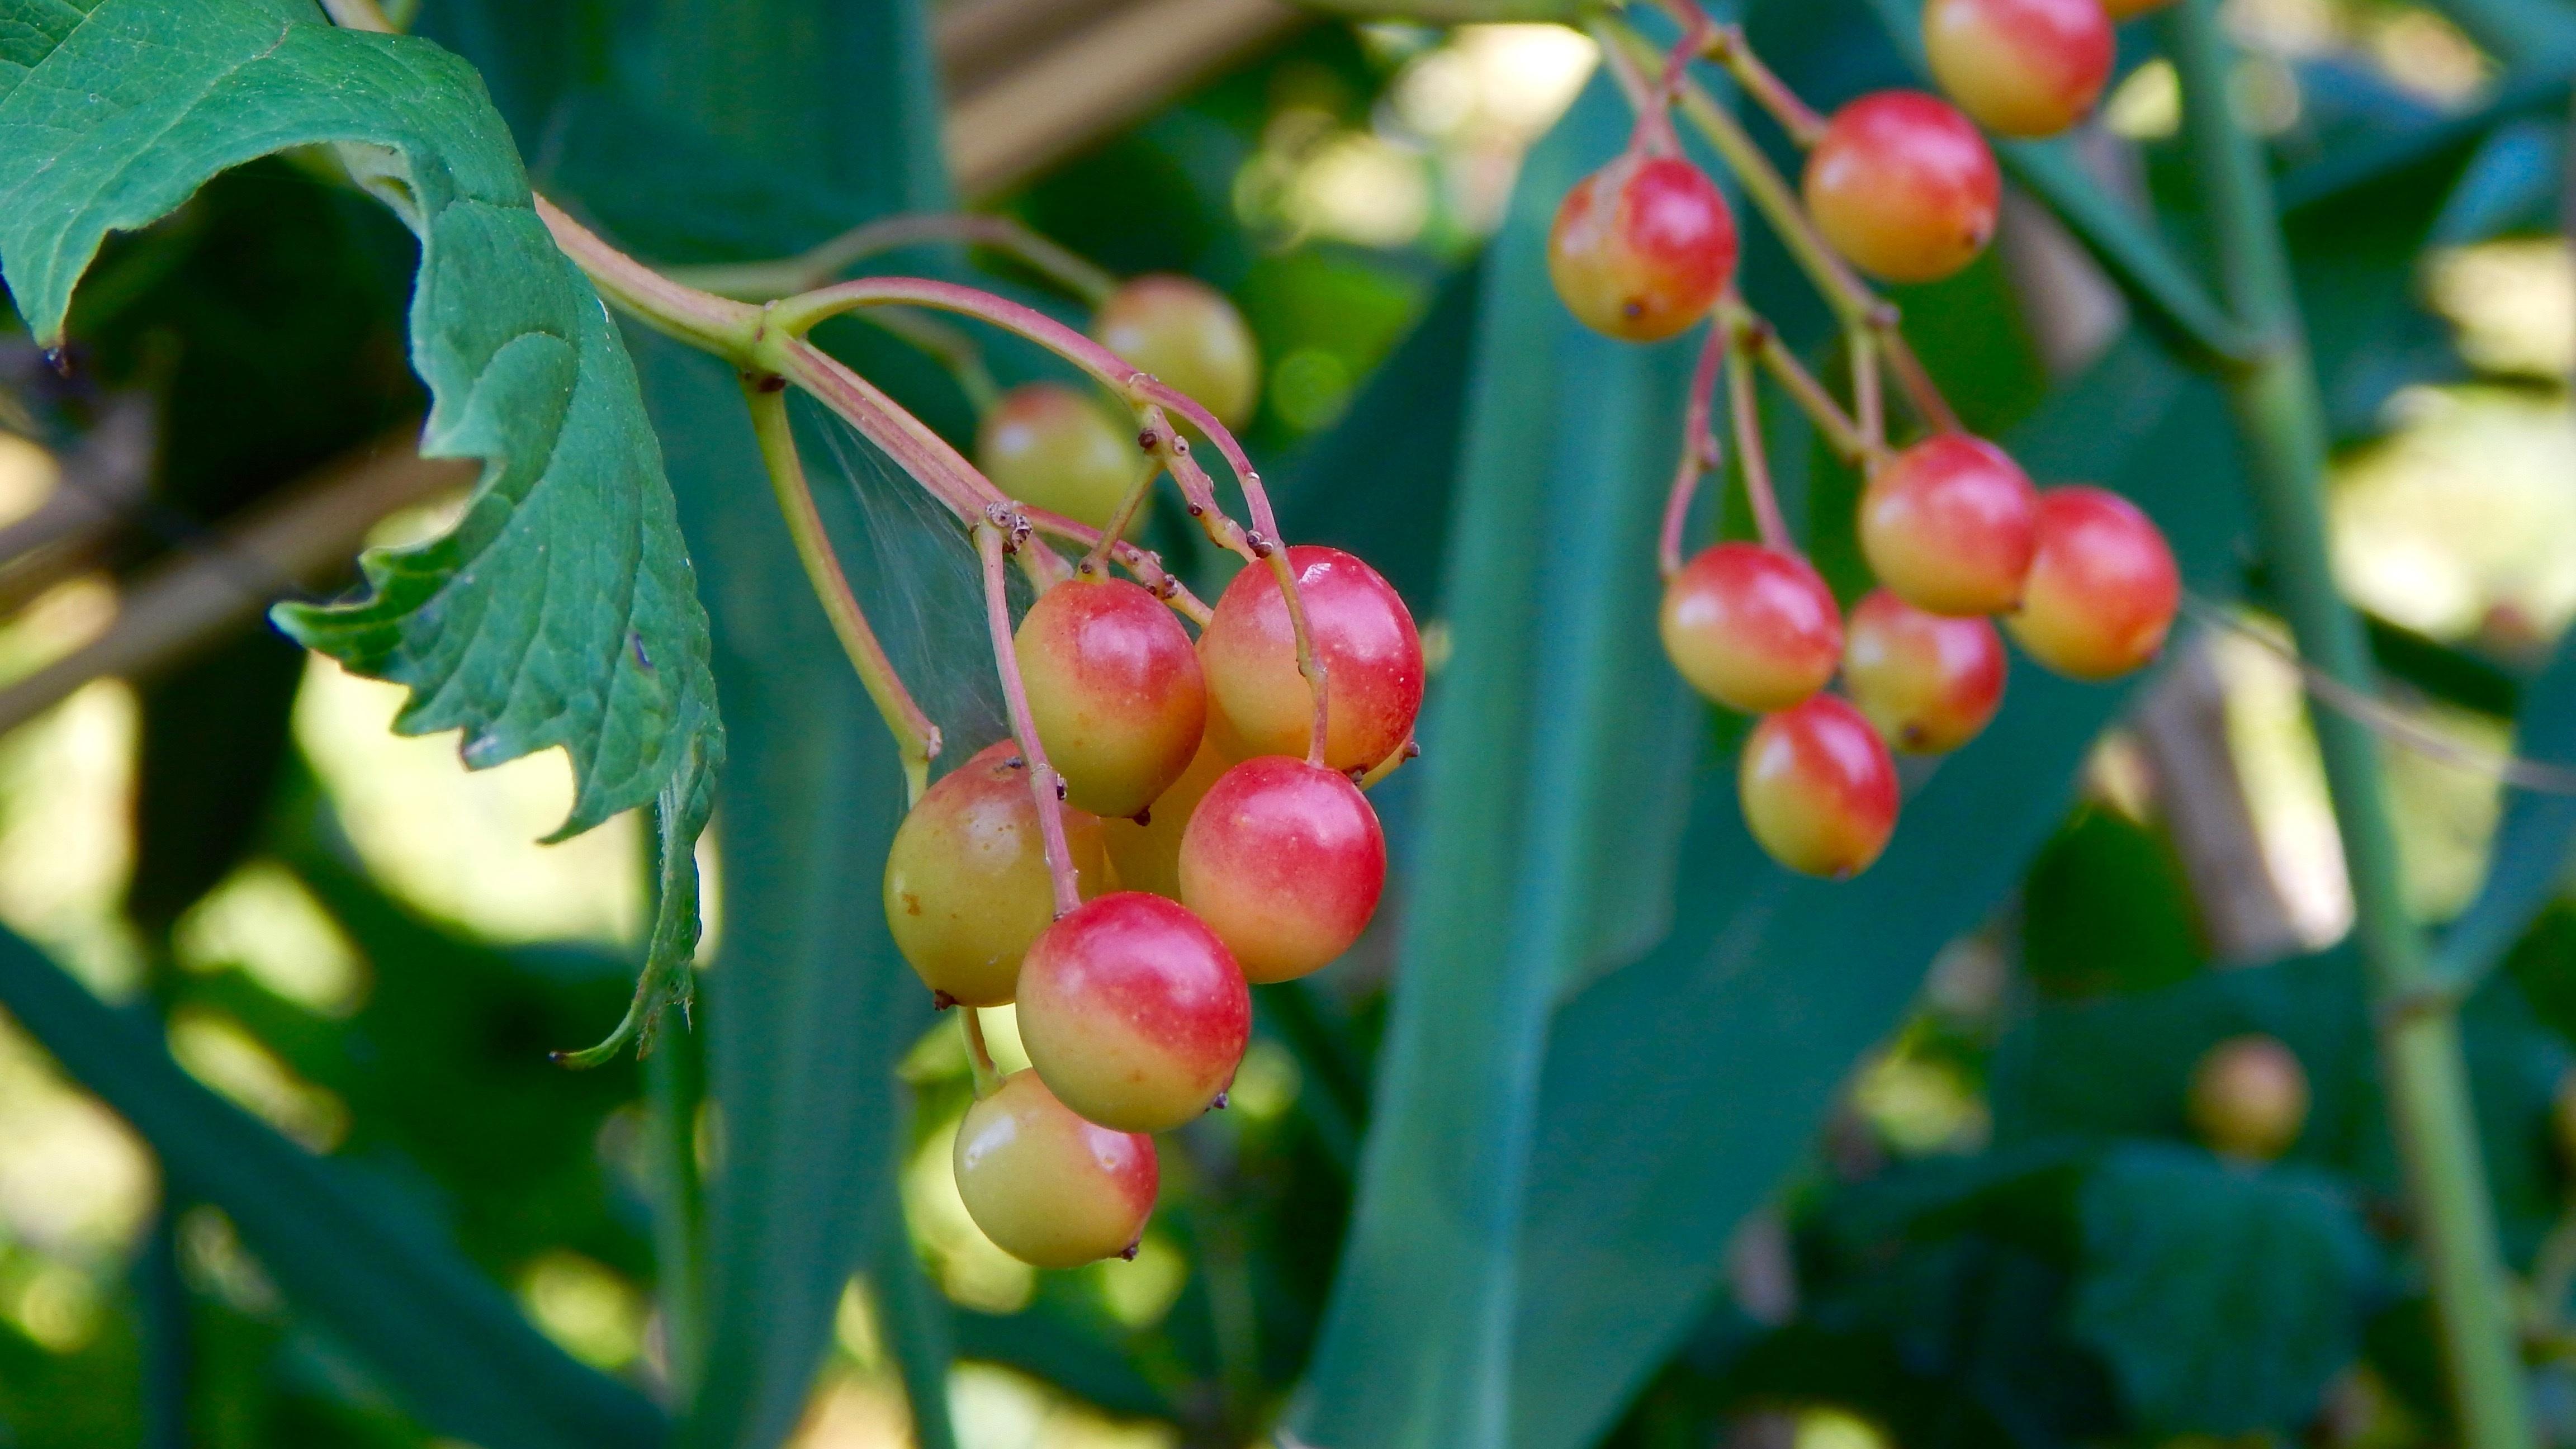 Free Images : nature, fruit, berry, flower, foliage, food, produce ...